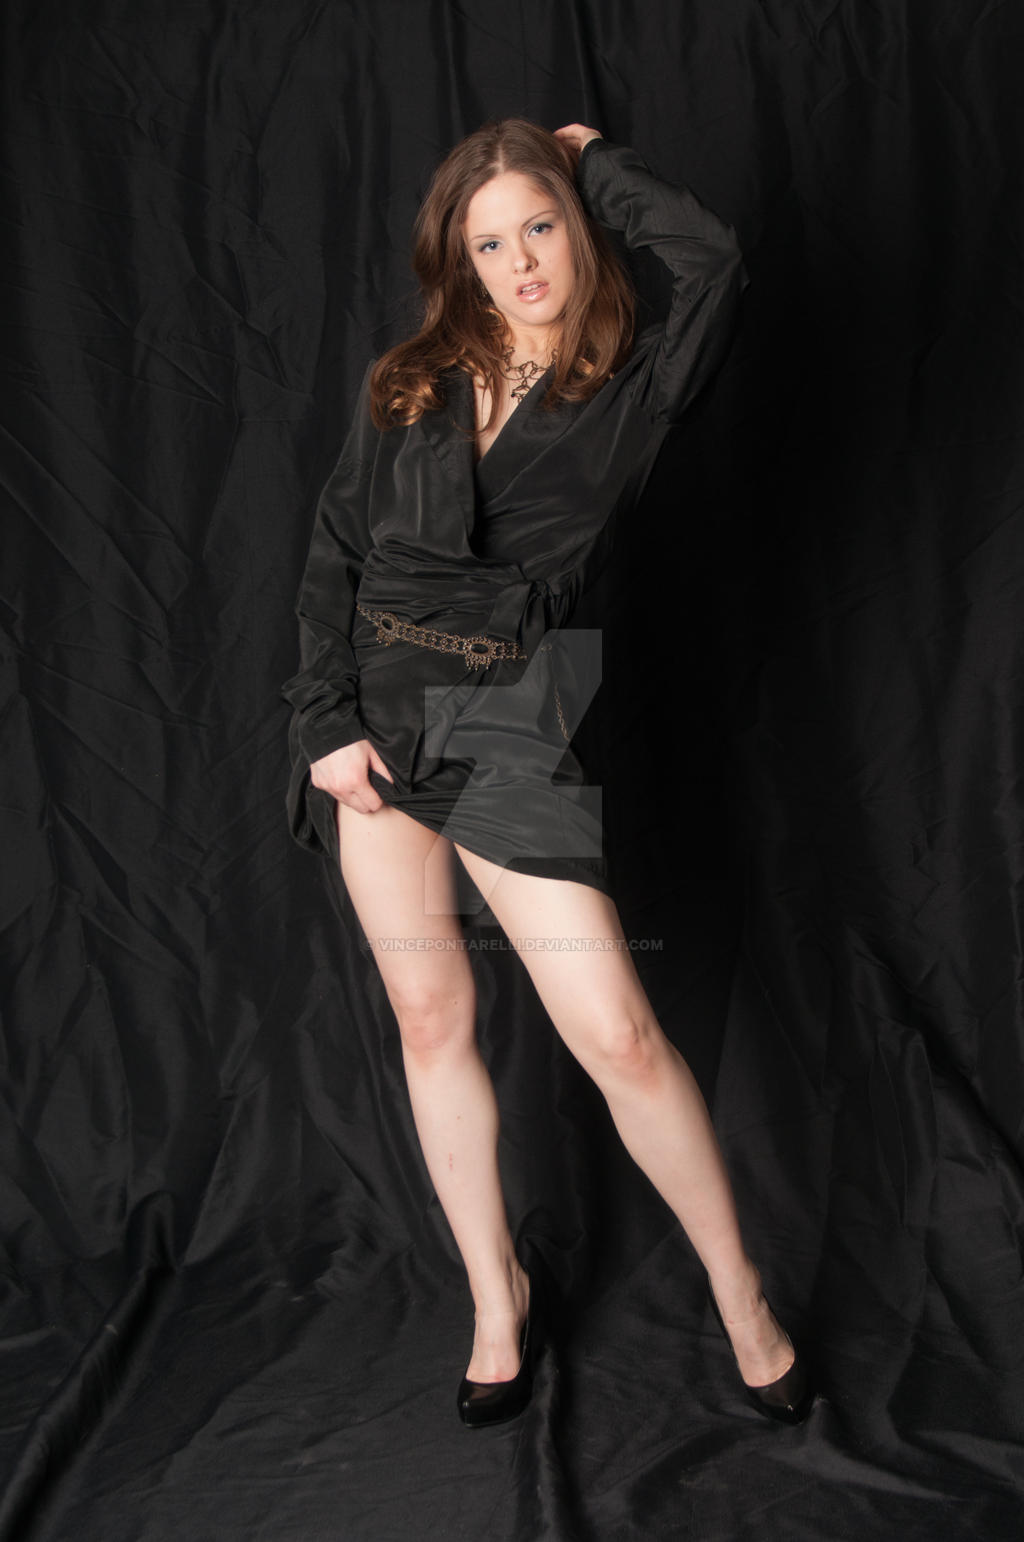 Josee Lanue Nude Photos 52